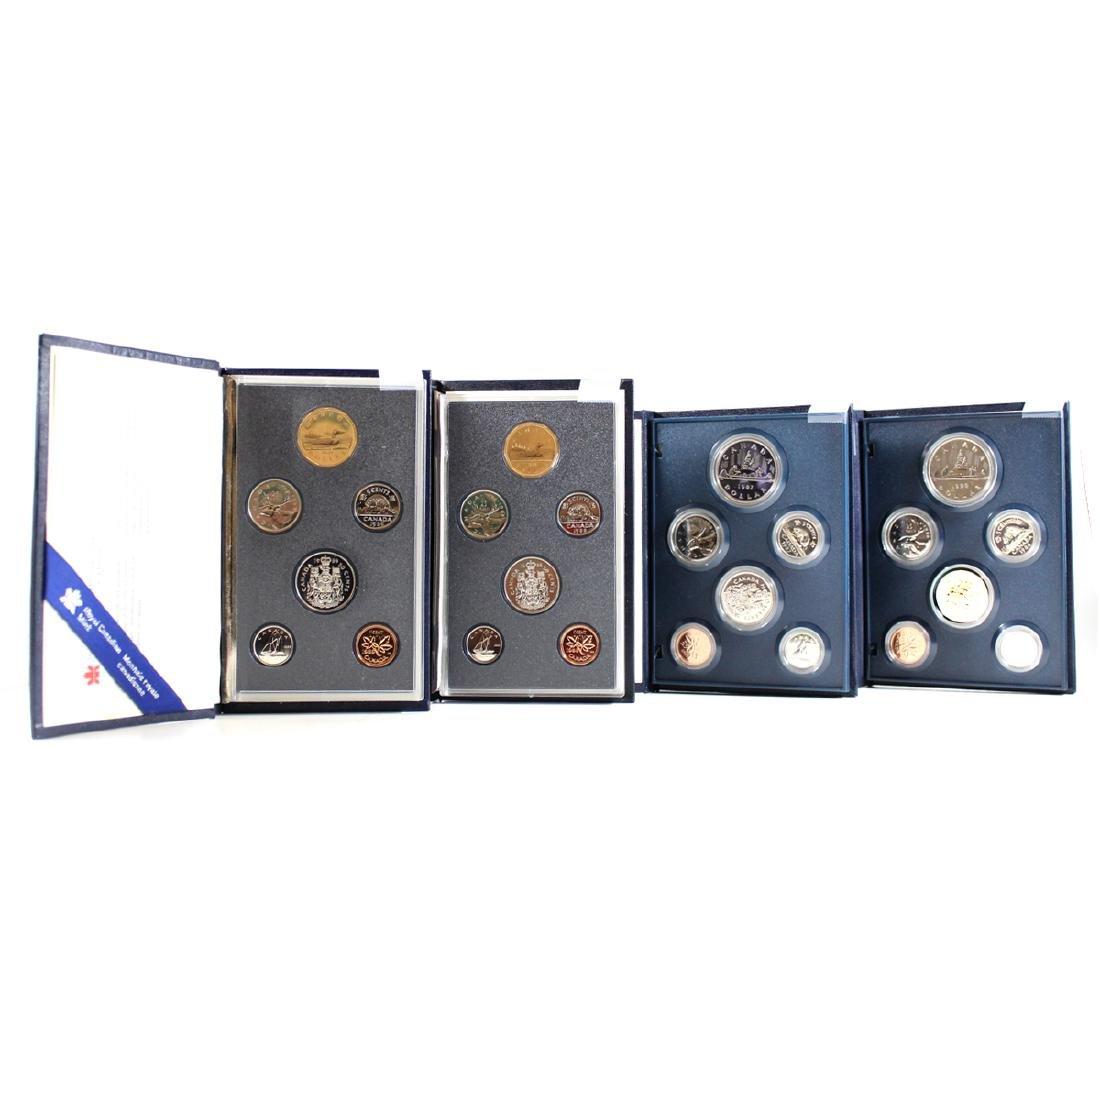 1986, 1987, 1988, 1989 Canada Specimen 6-Coin Sets.